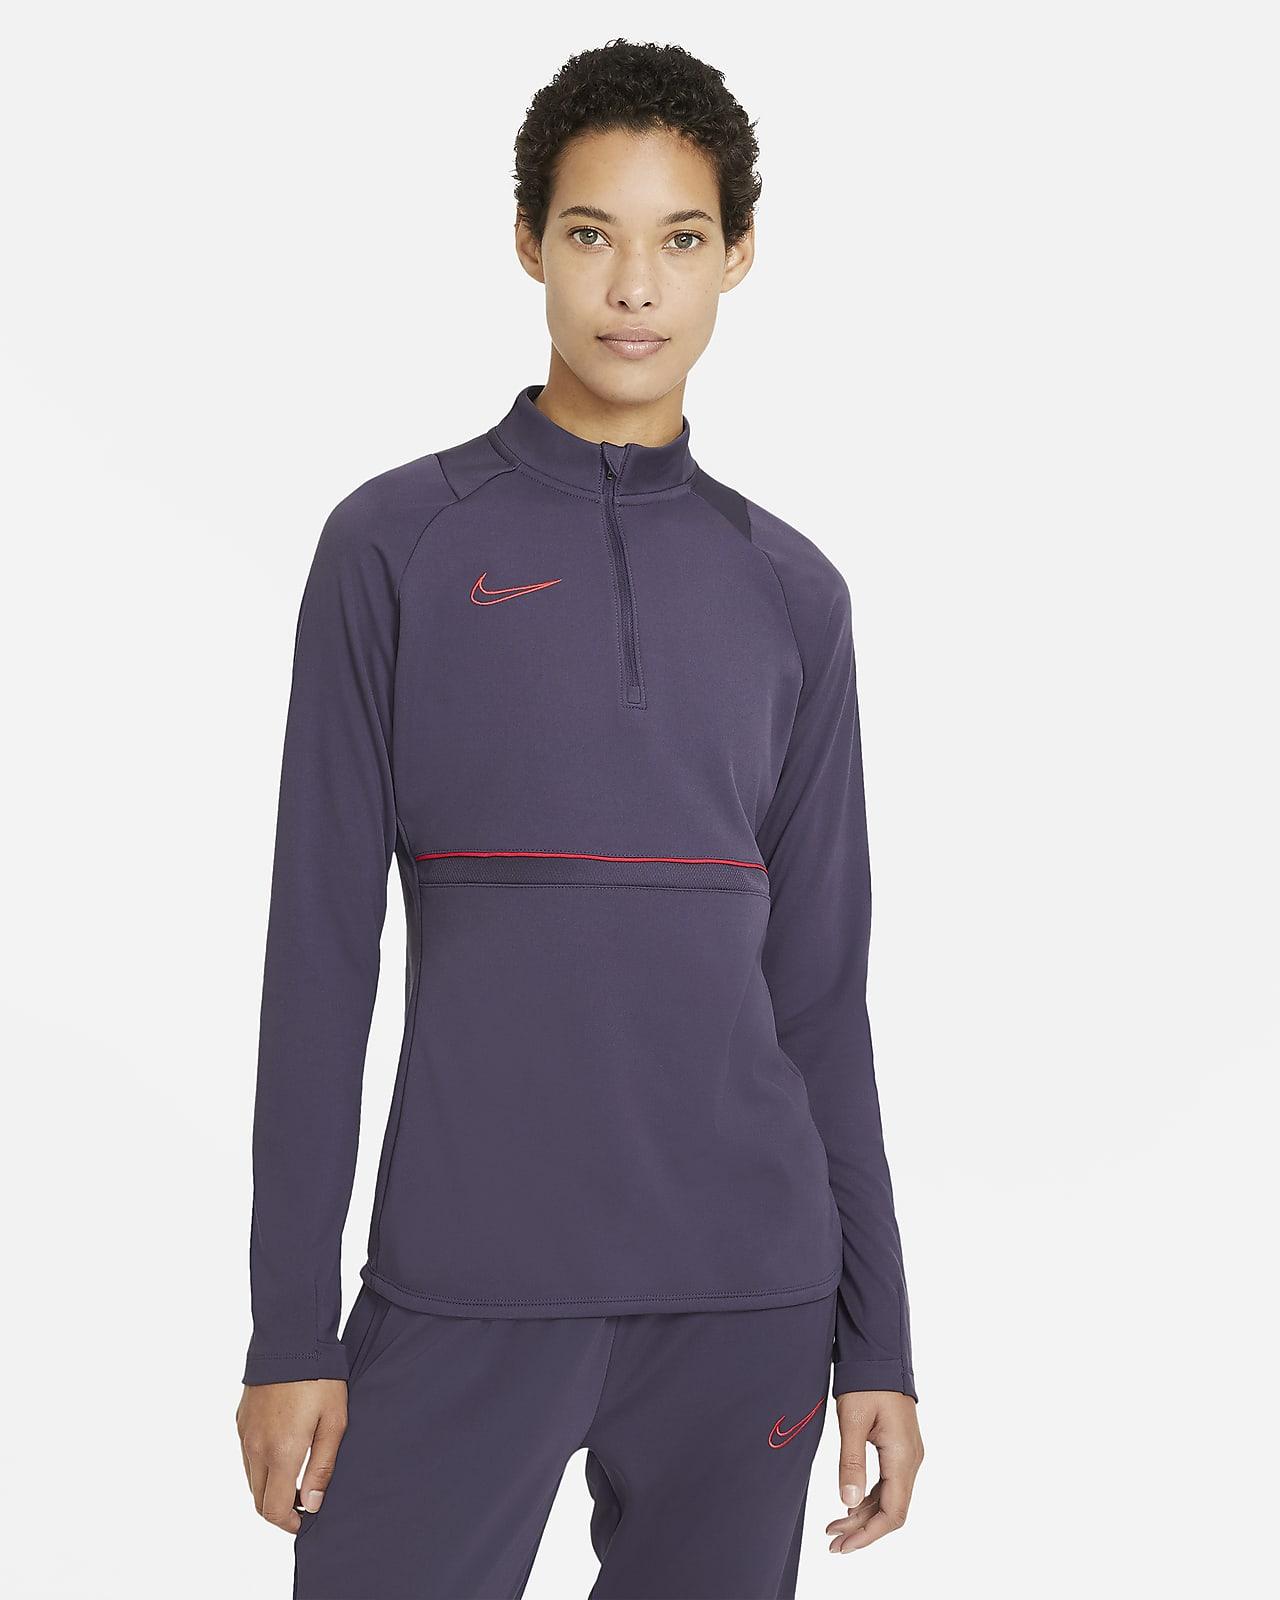 Damska treningowa koszulka piłkarska Nike Dri-FIT Academy